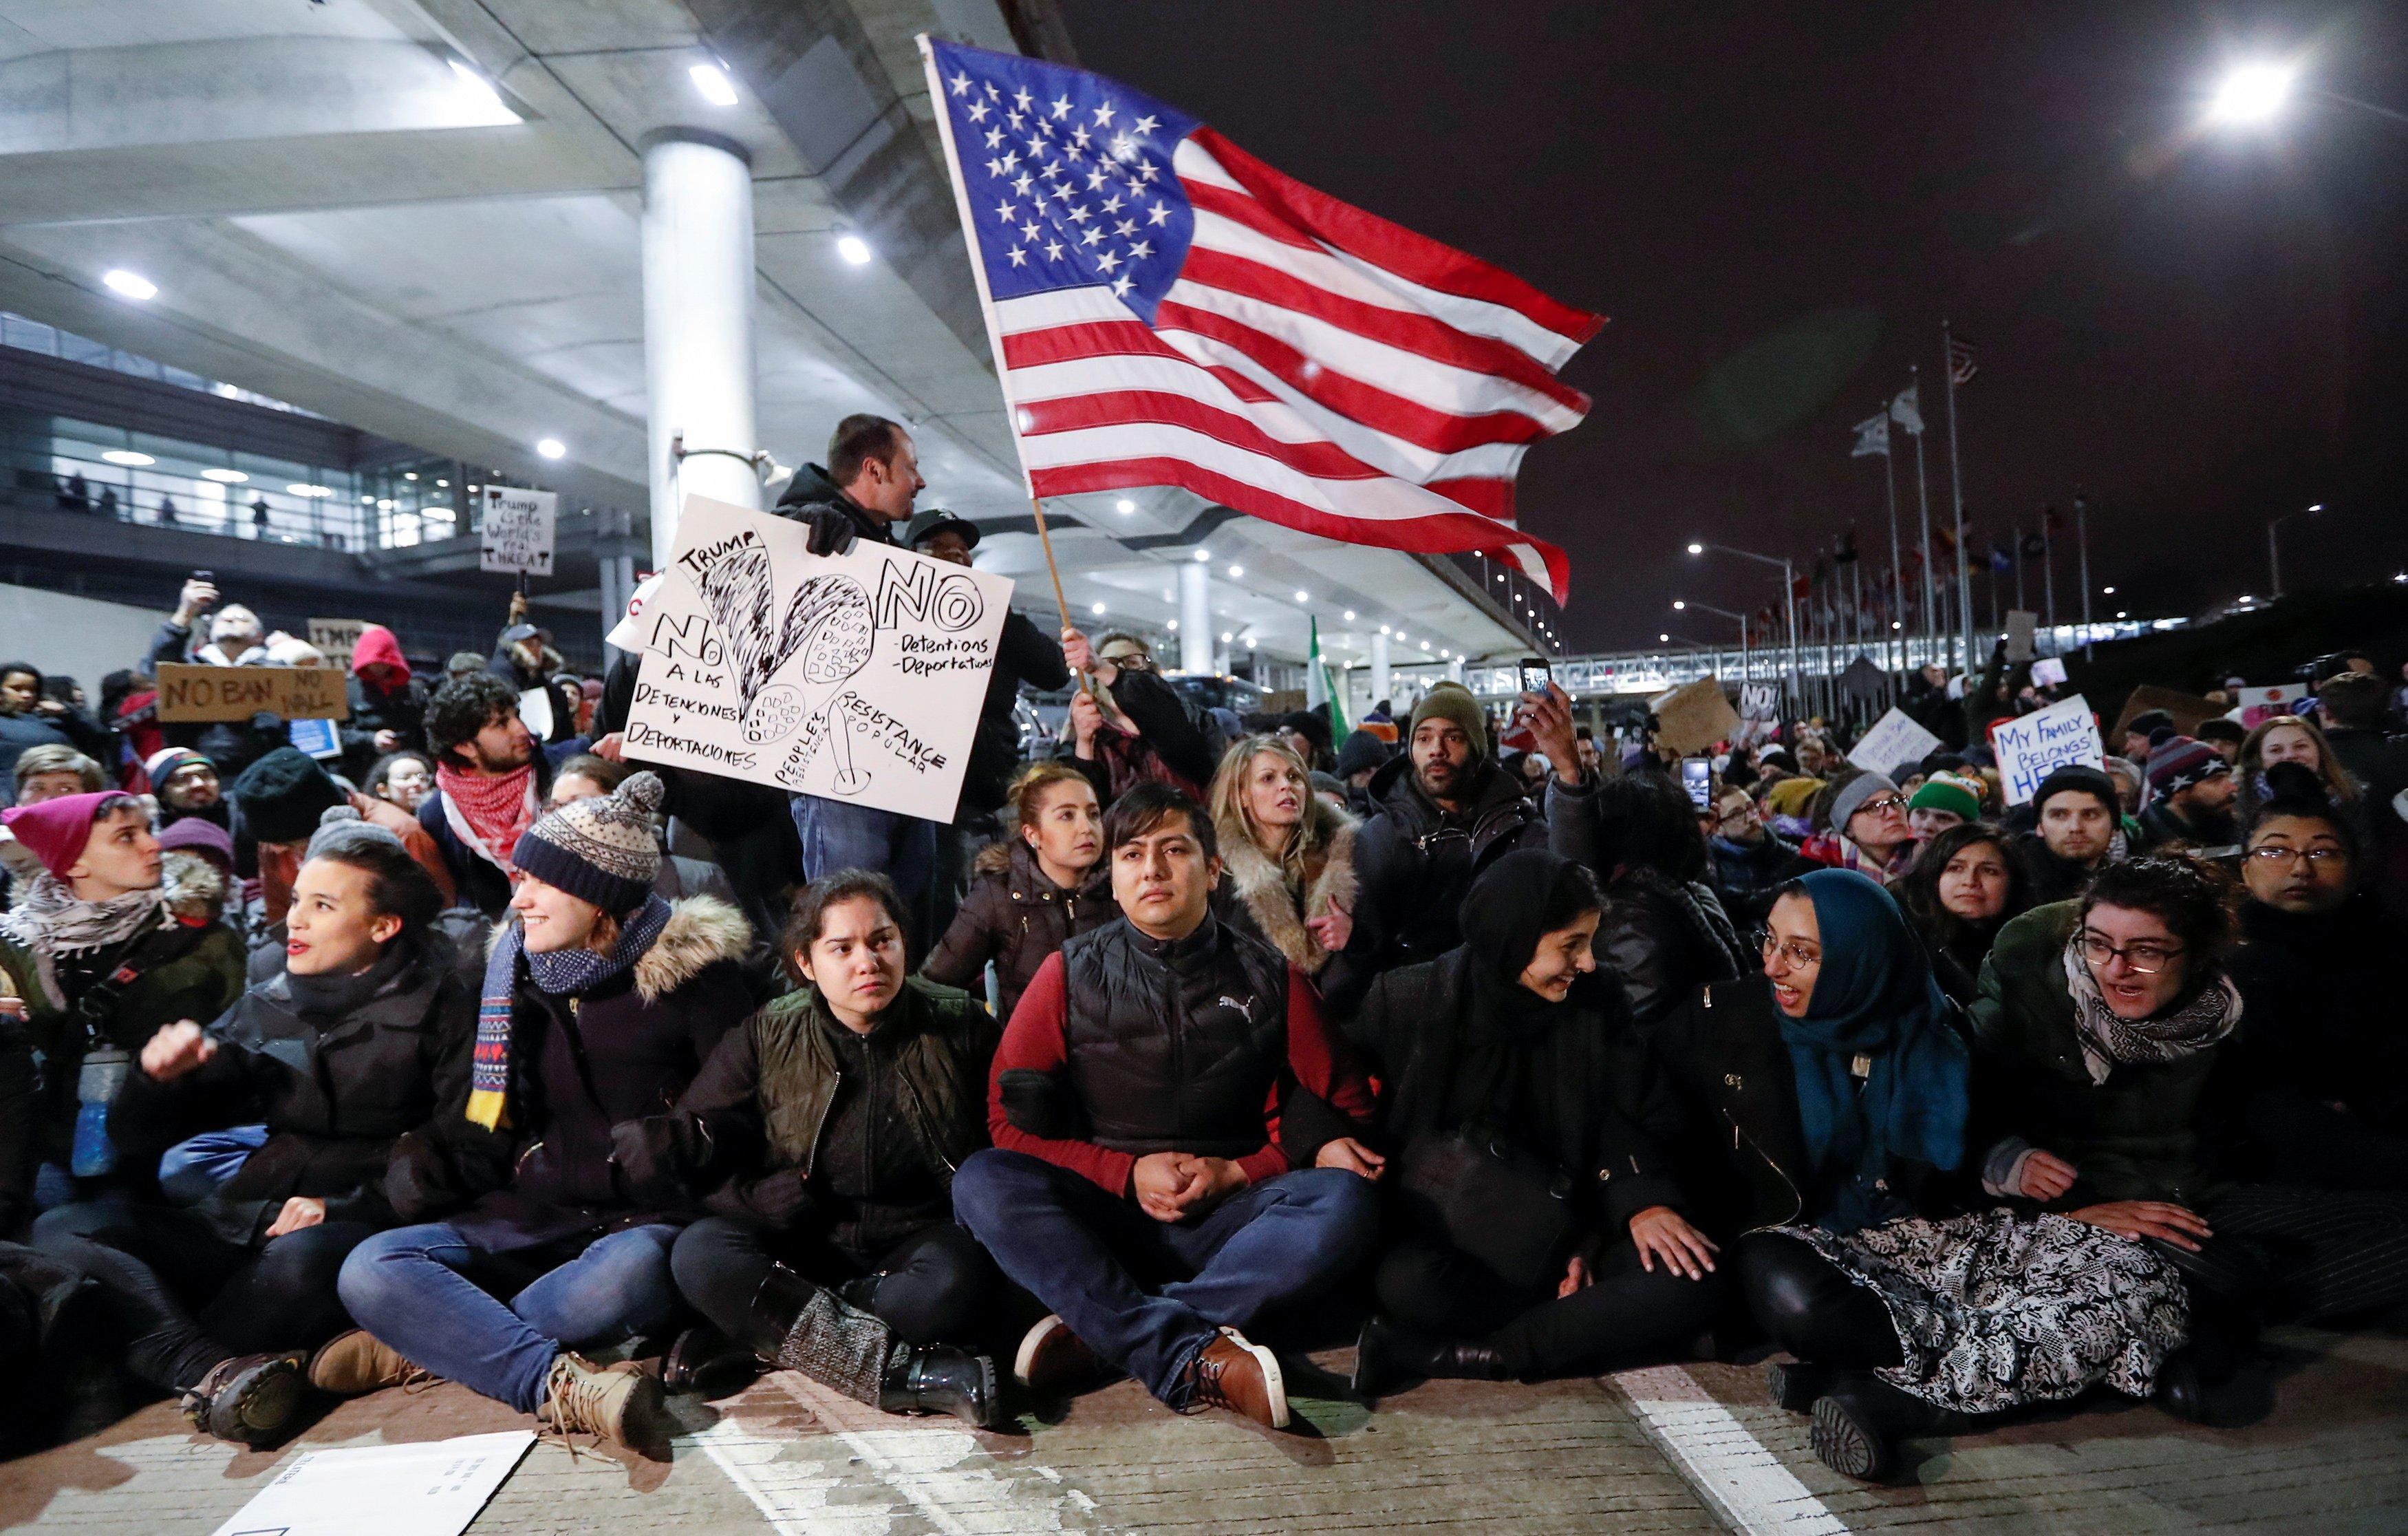 Warga berkumpul memprotes larangan perjalanan yang dikenakan oleh perintah eksekutif Presiden Amerika Serikat Donald Trump di bandara O'Hare di Chicago, Illinois, Amerika Serikat, Sabtu (28/1)